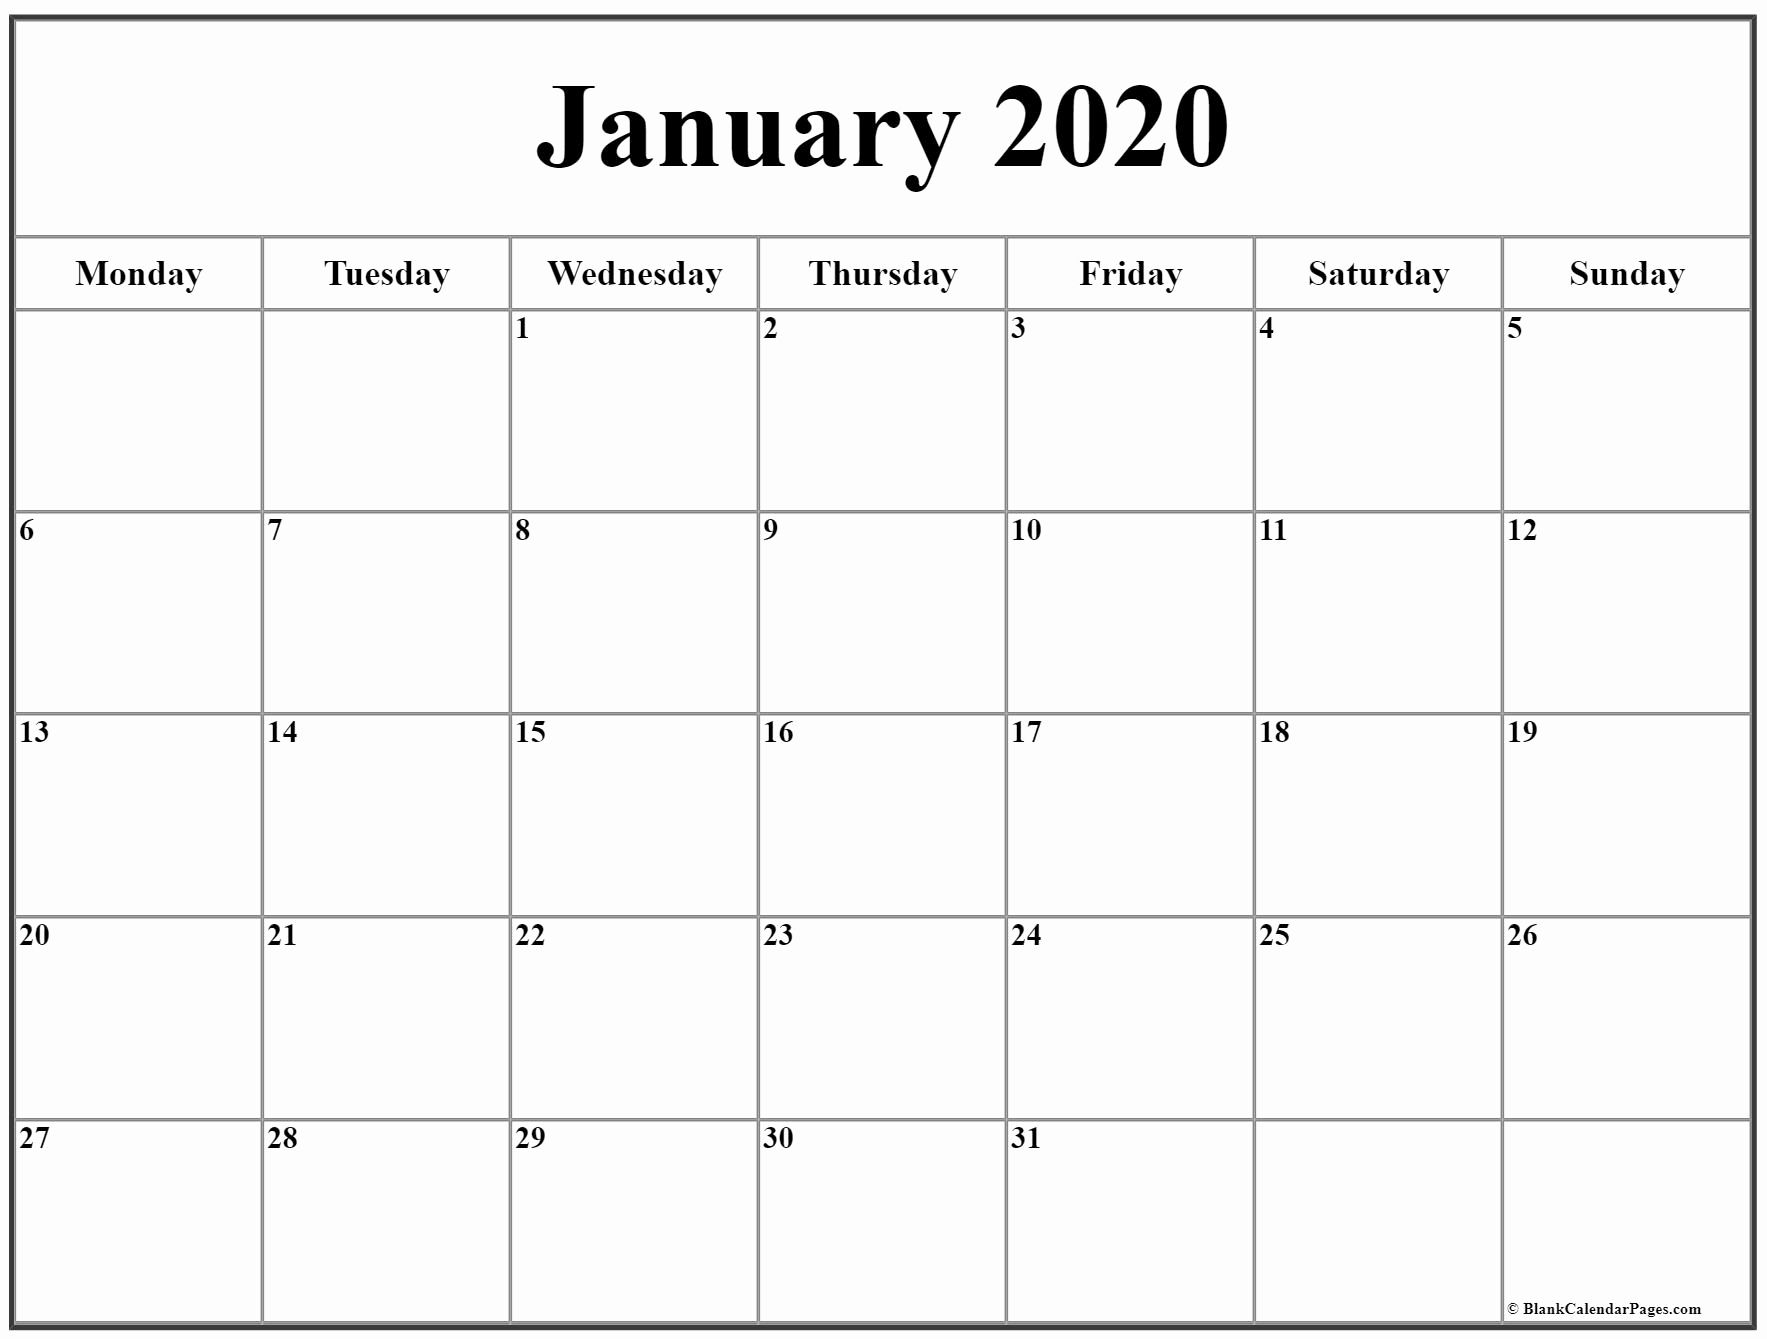 Printable Calendar Starting With Monday In 2020 | Calendar